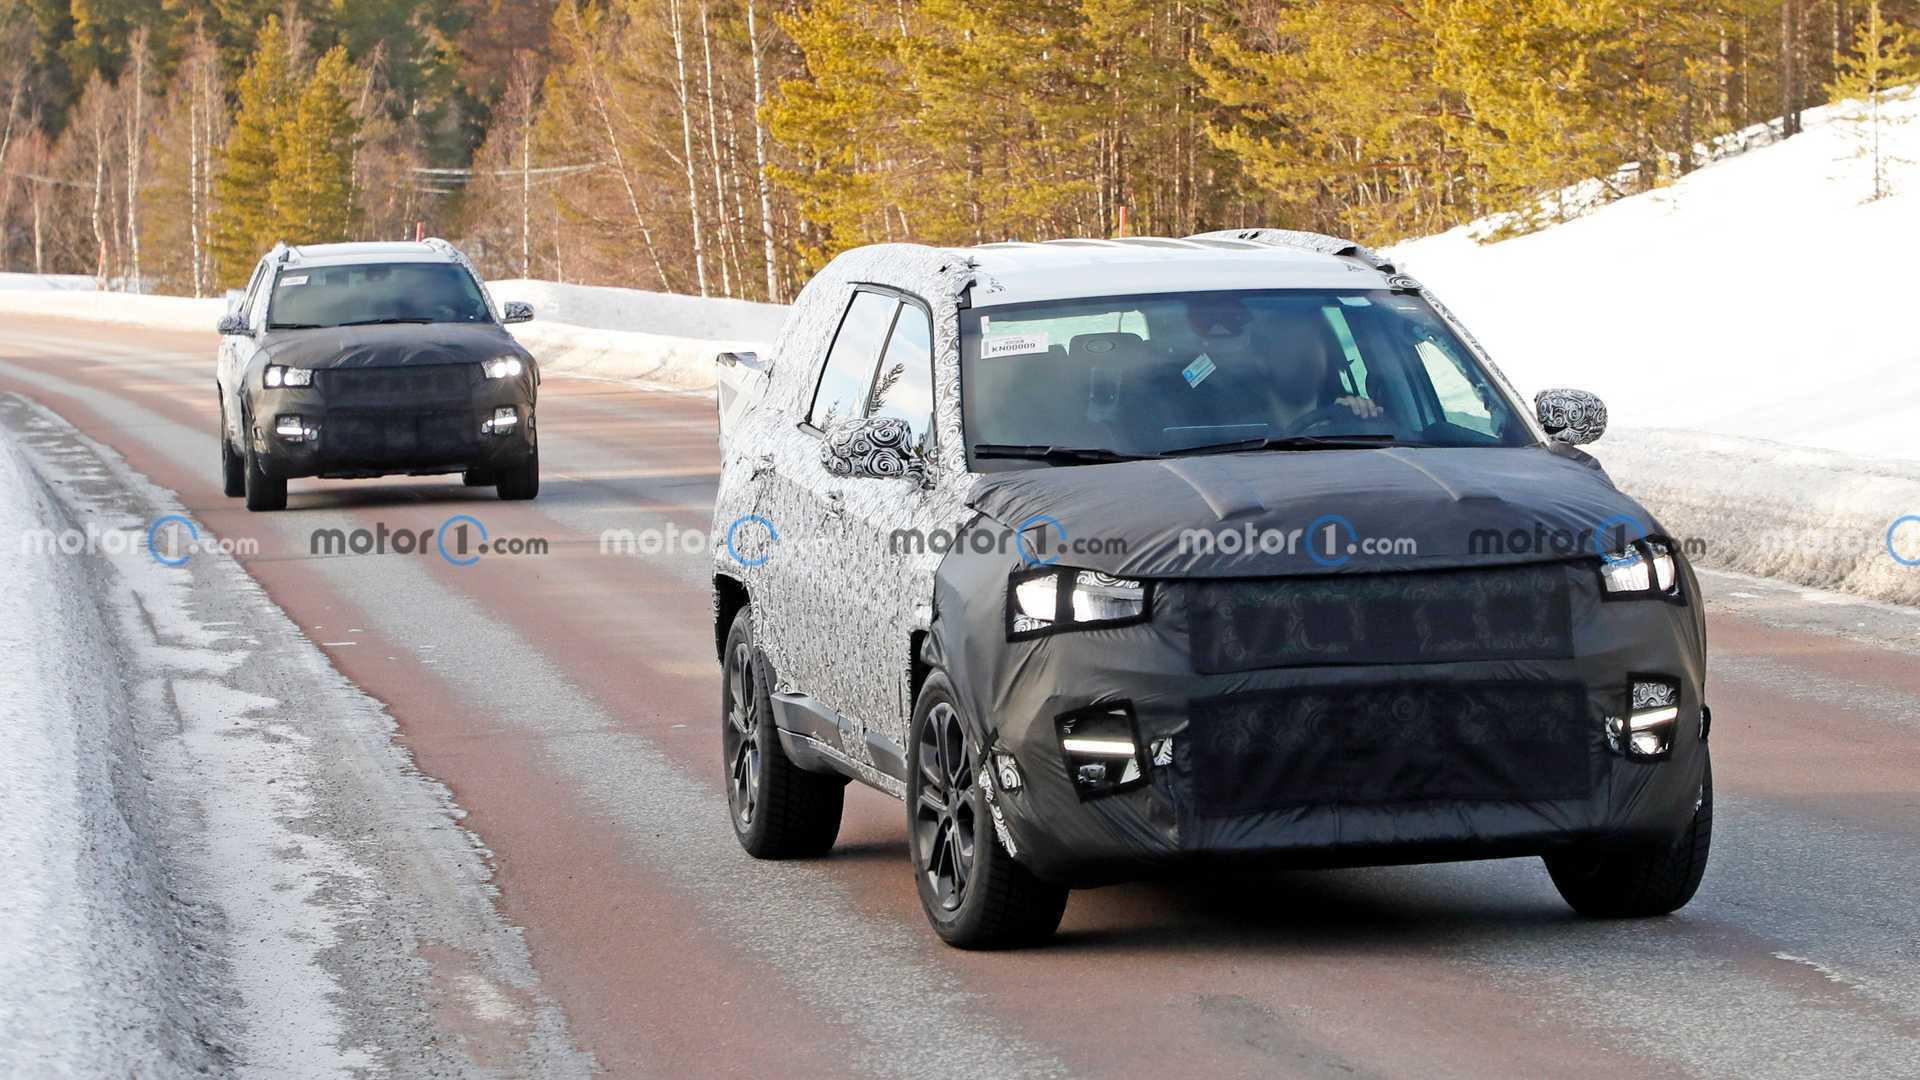 Jeep Compass Three-Row SUV Front Spy Photo